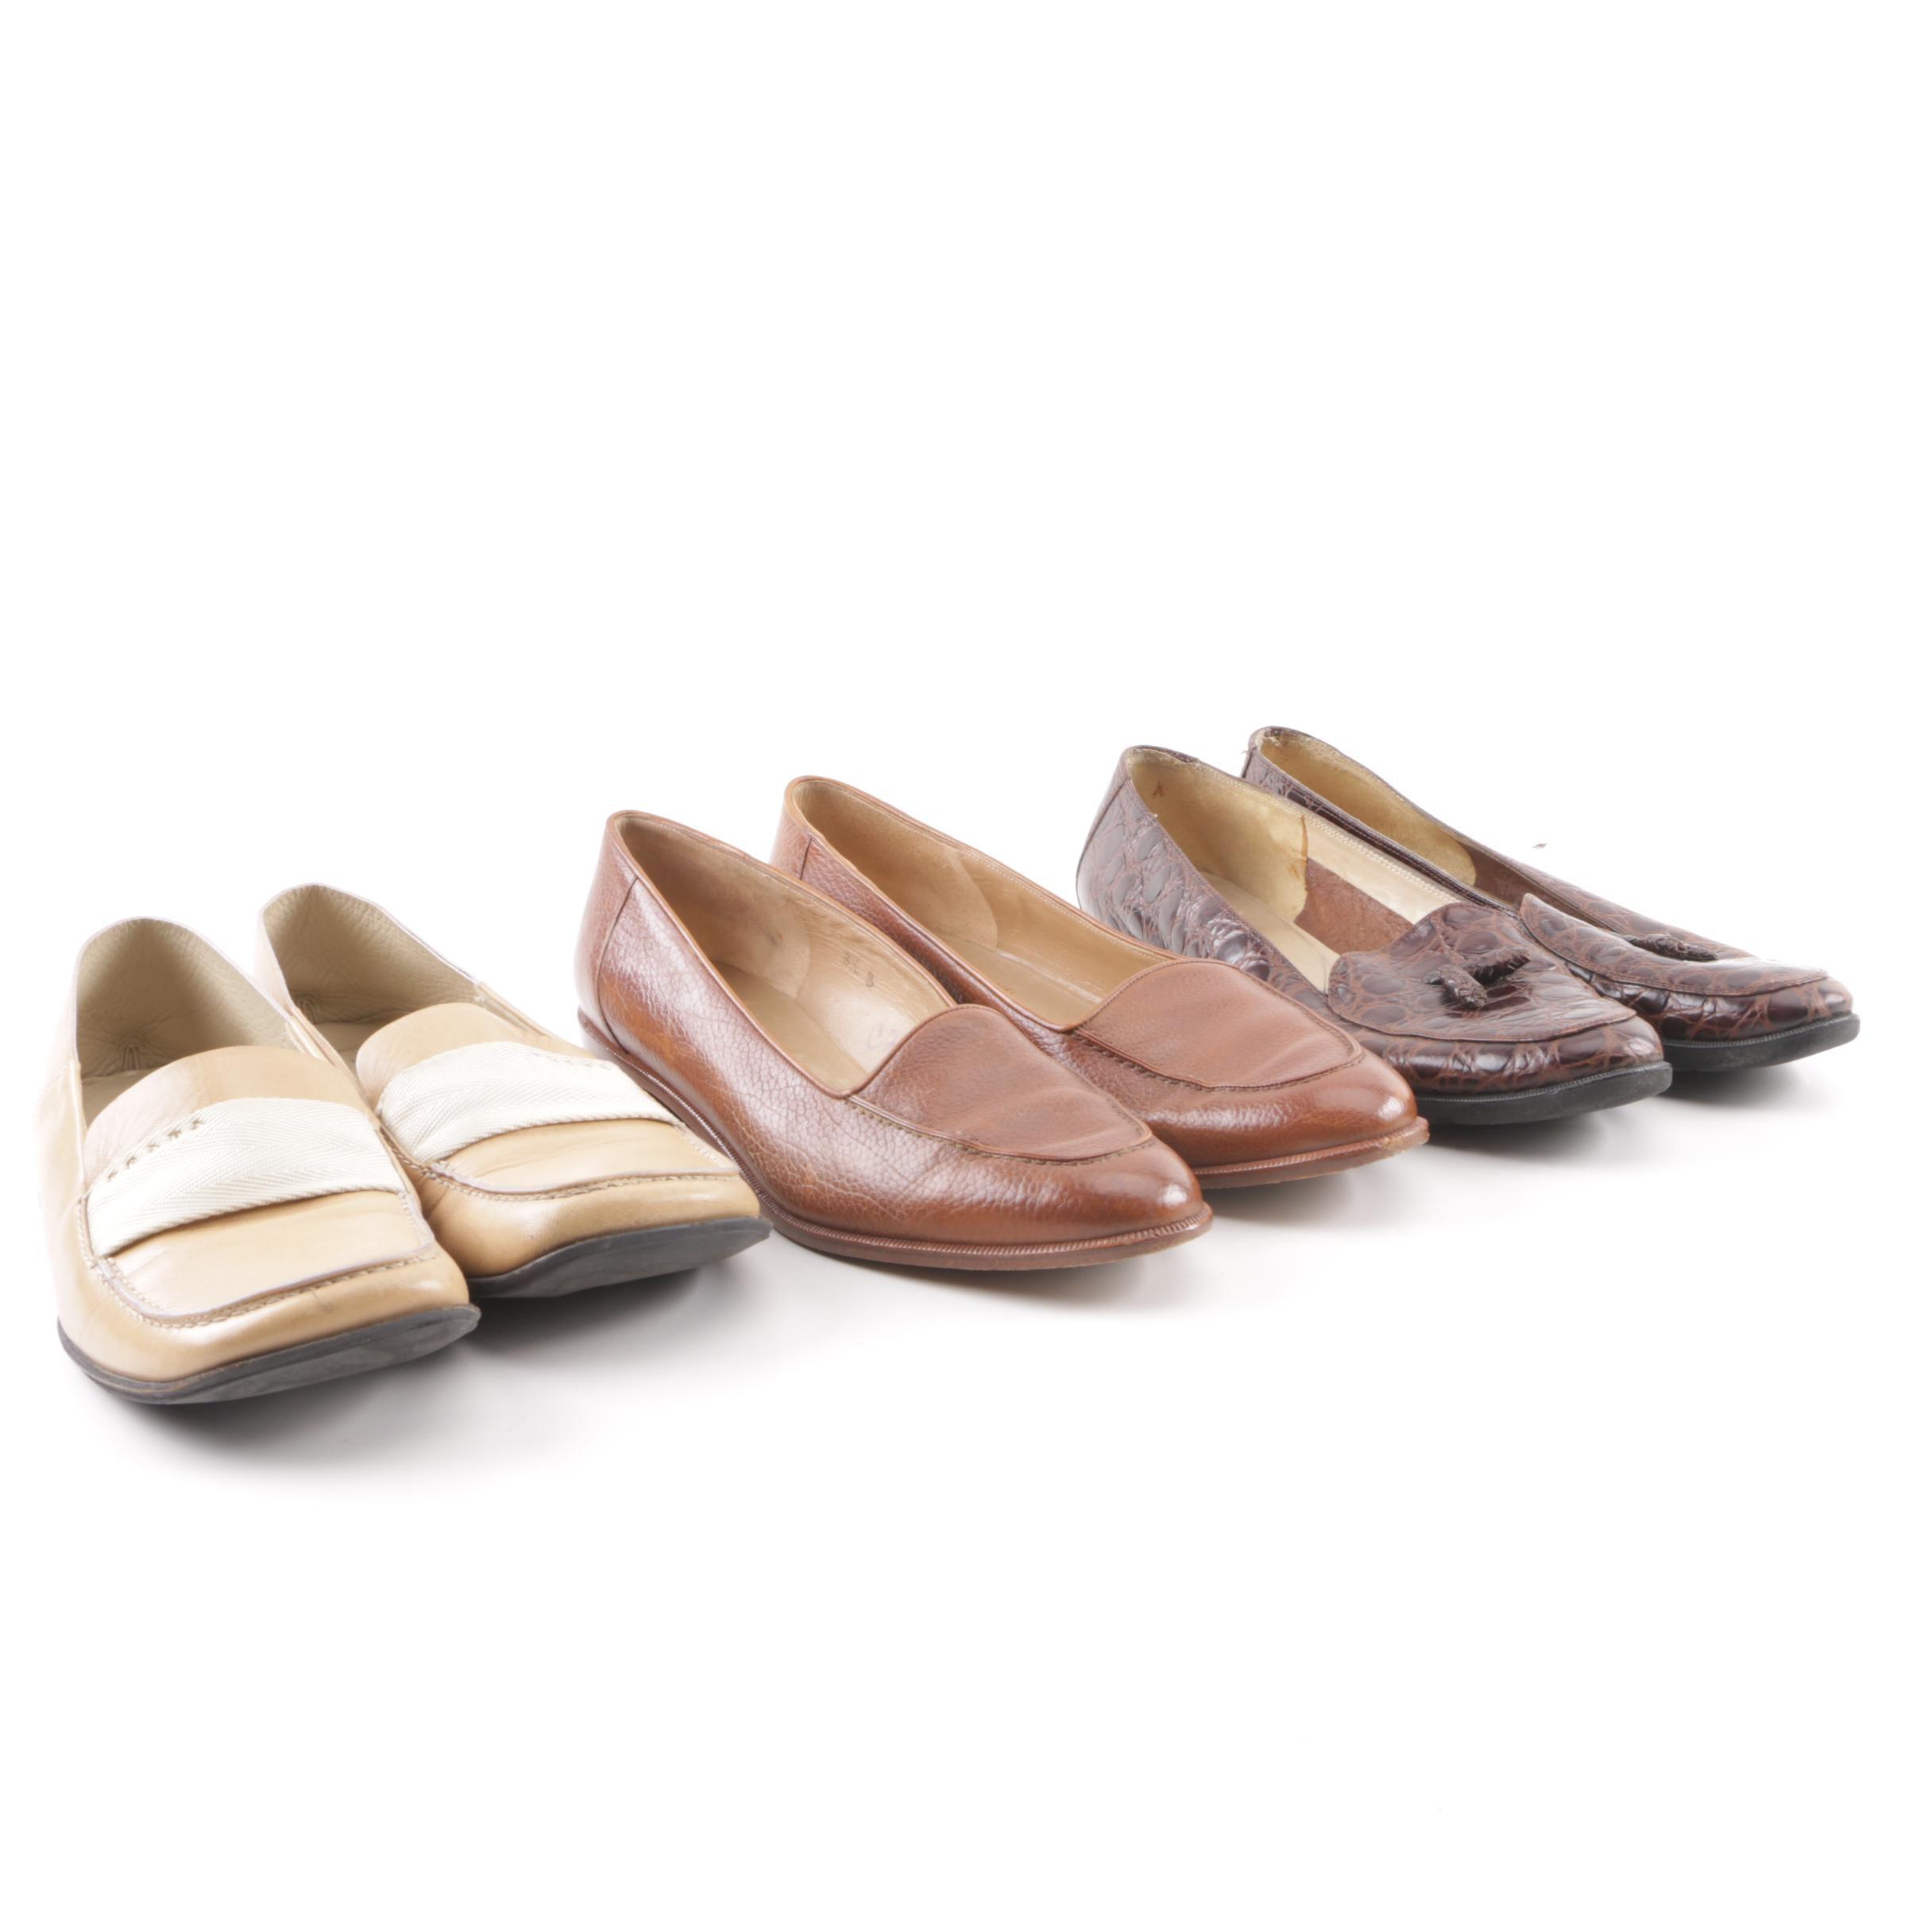 Women's Prada and Salvatore Ferragamo Leather Footwear